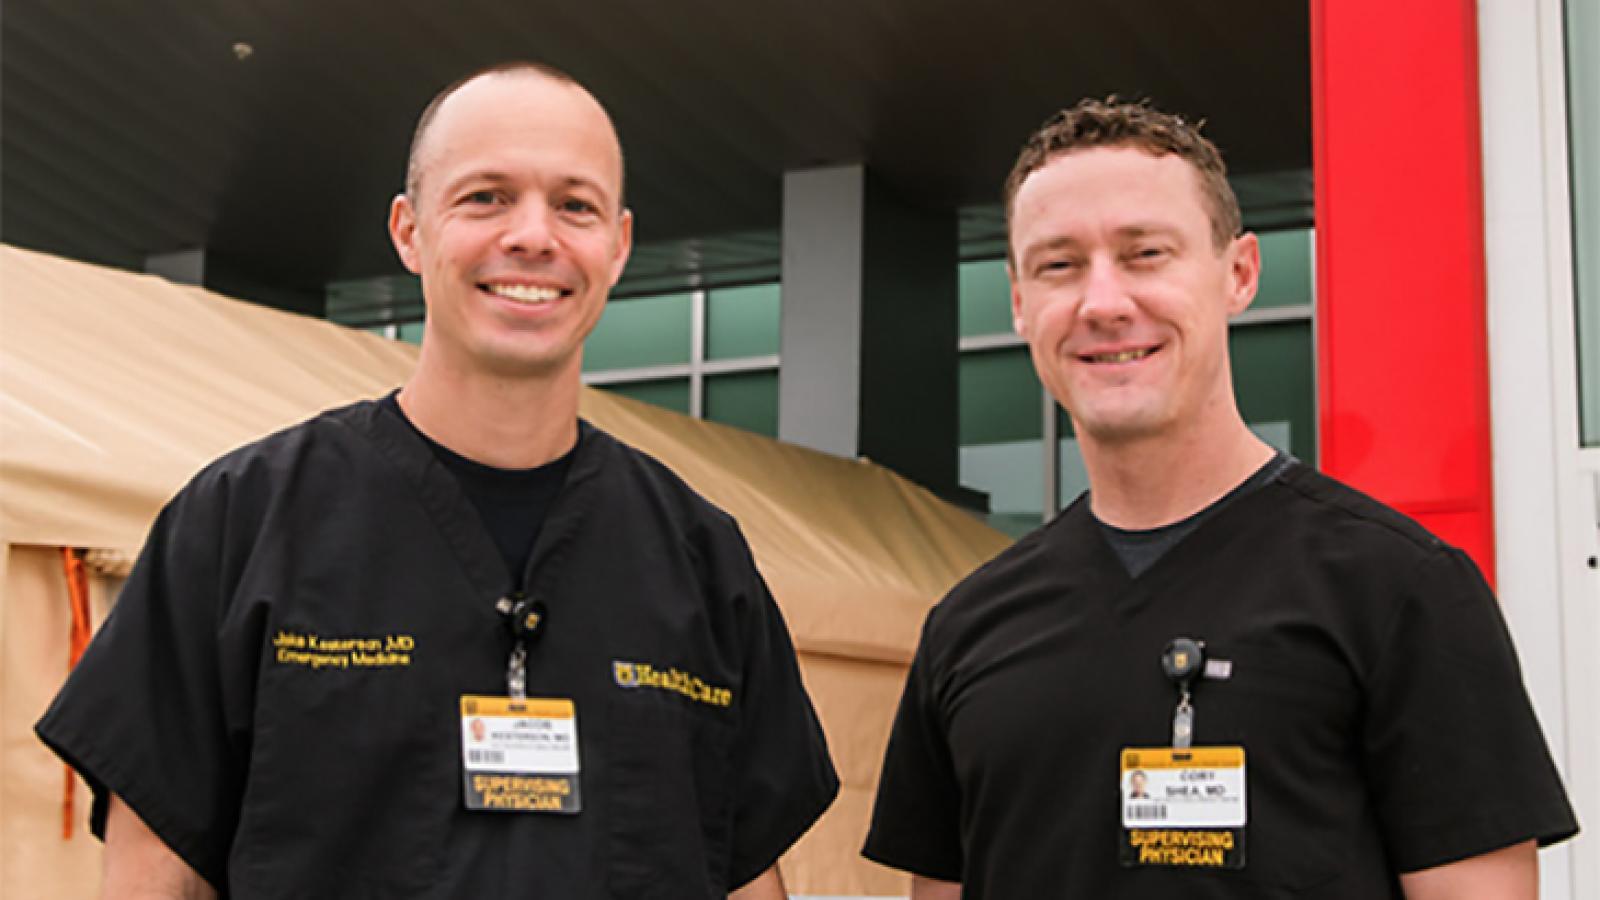 EM Dr. Kesterson and Dr. Shea